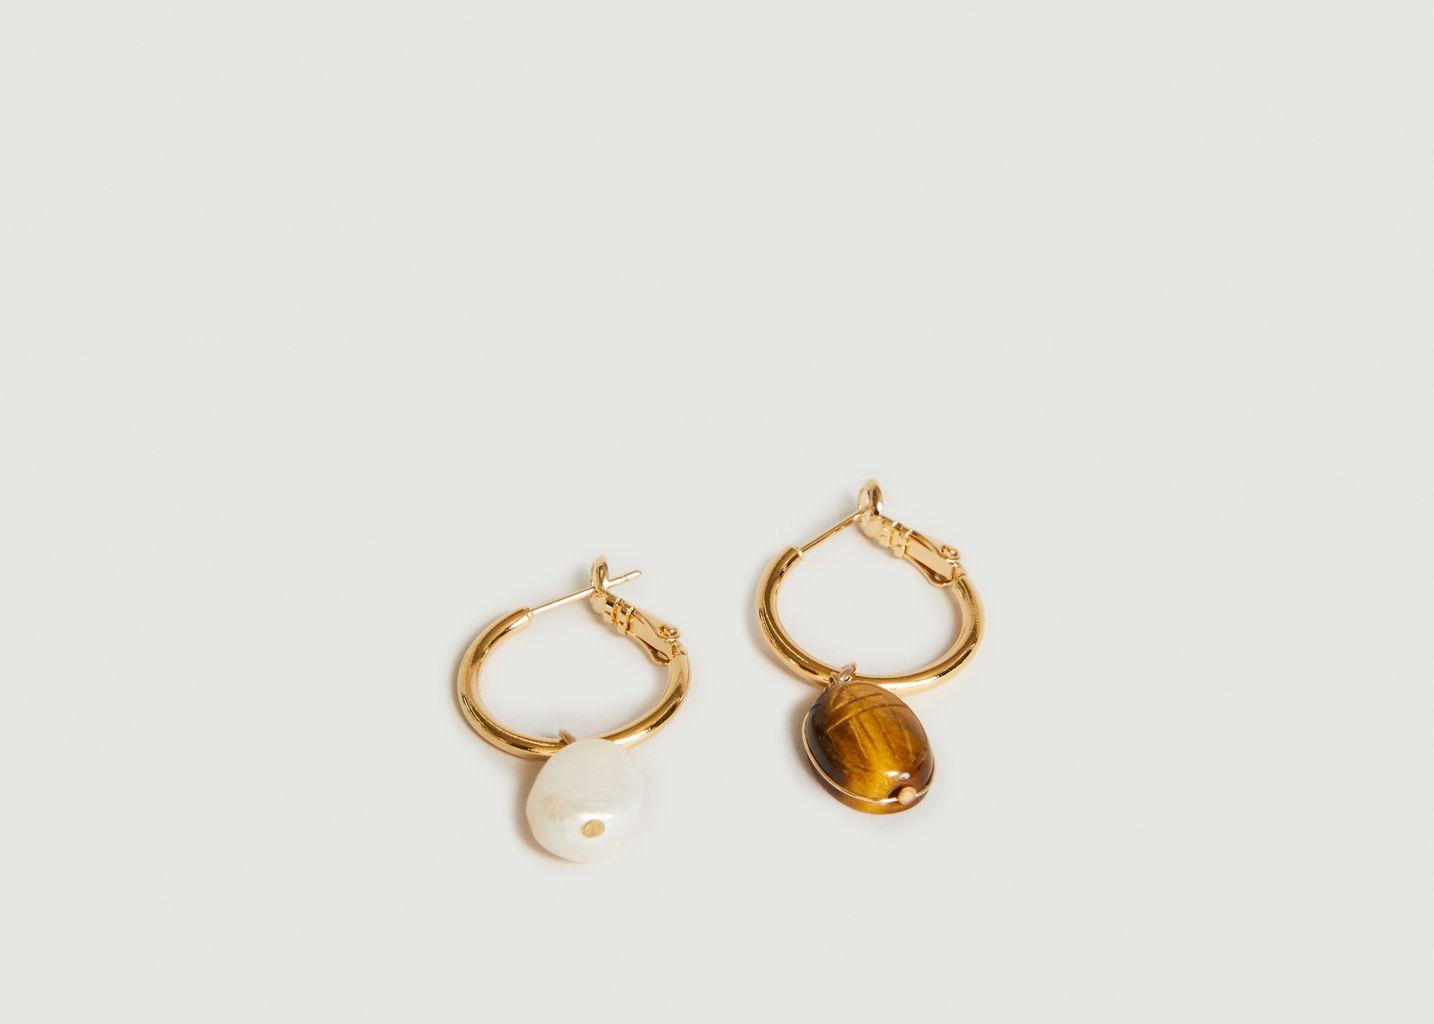 Boucles d'oreilles Ximena medium - Medecine Douce